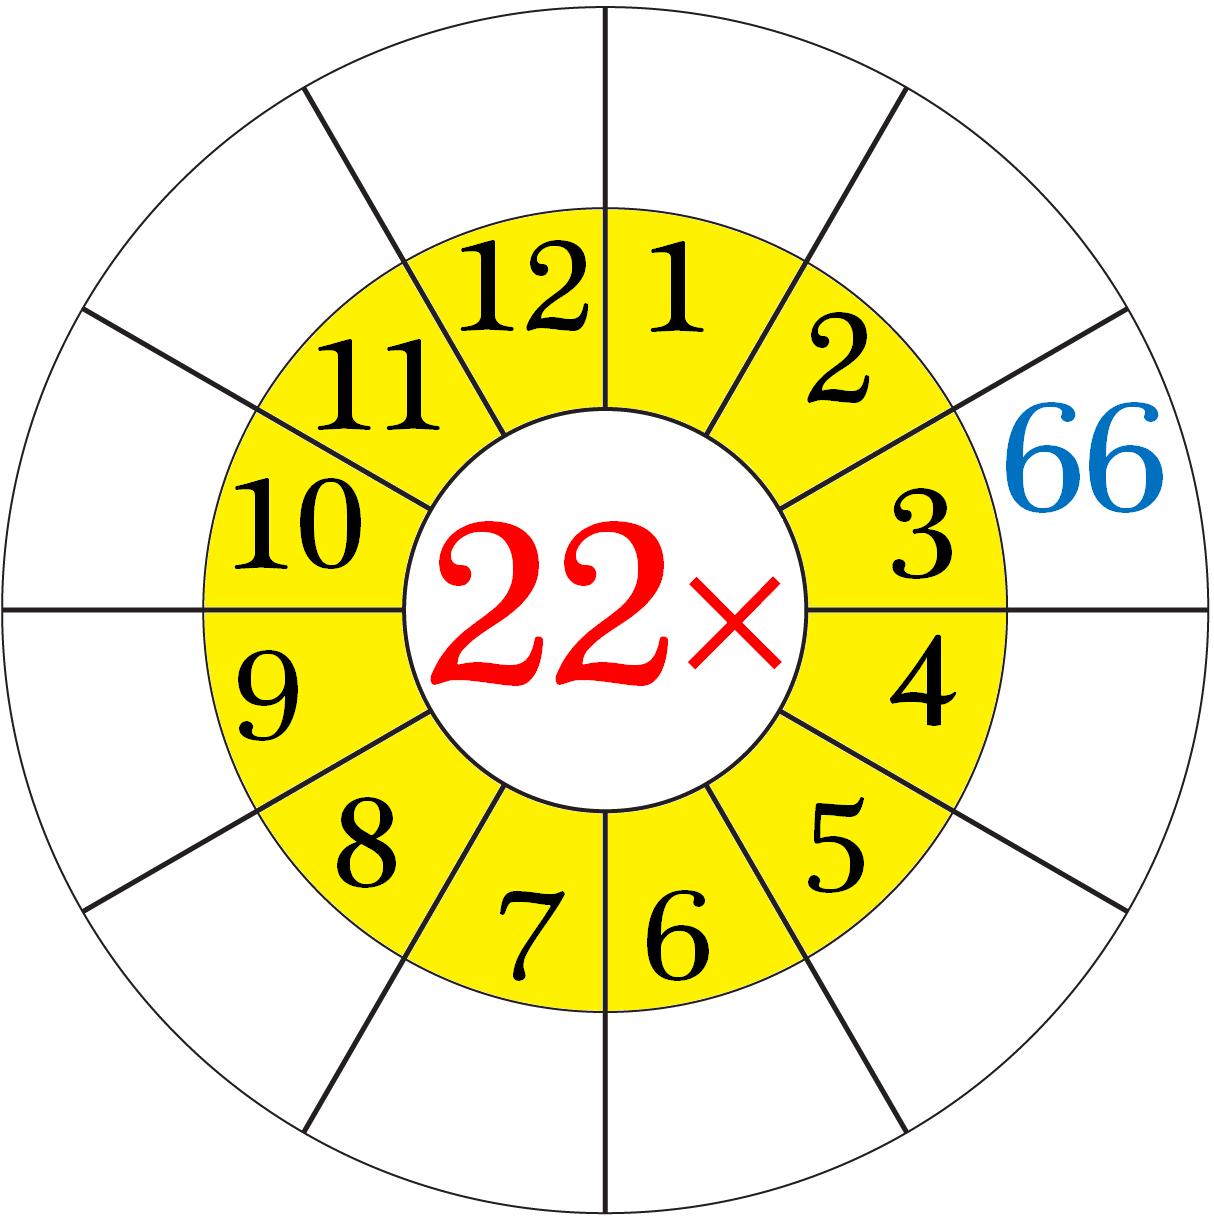 22 Times Multiplication Table Worksheet